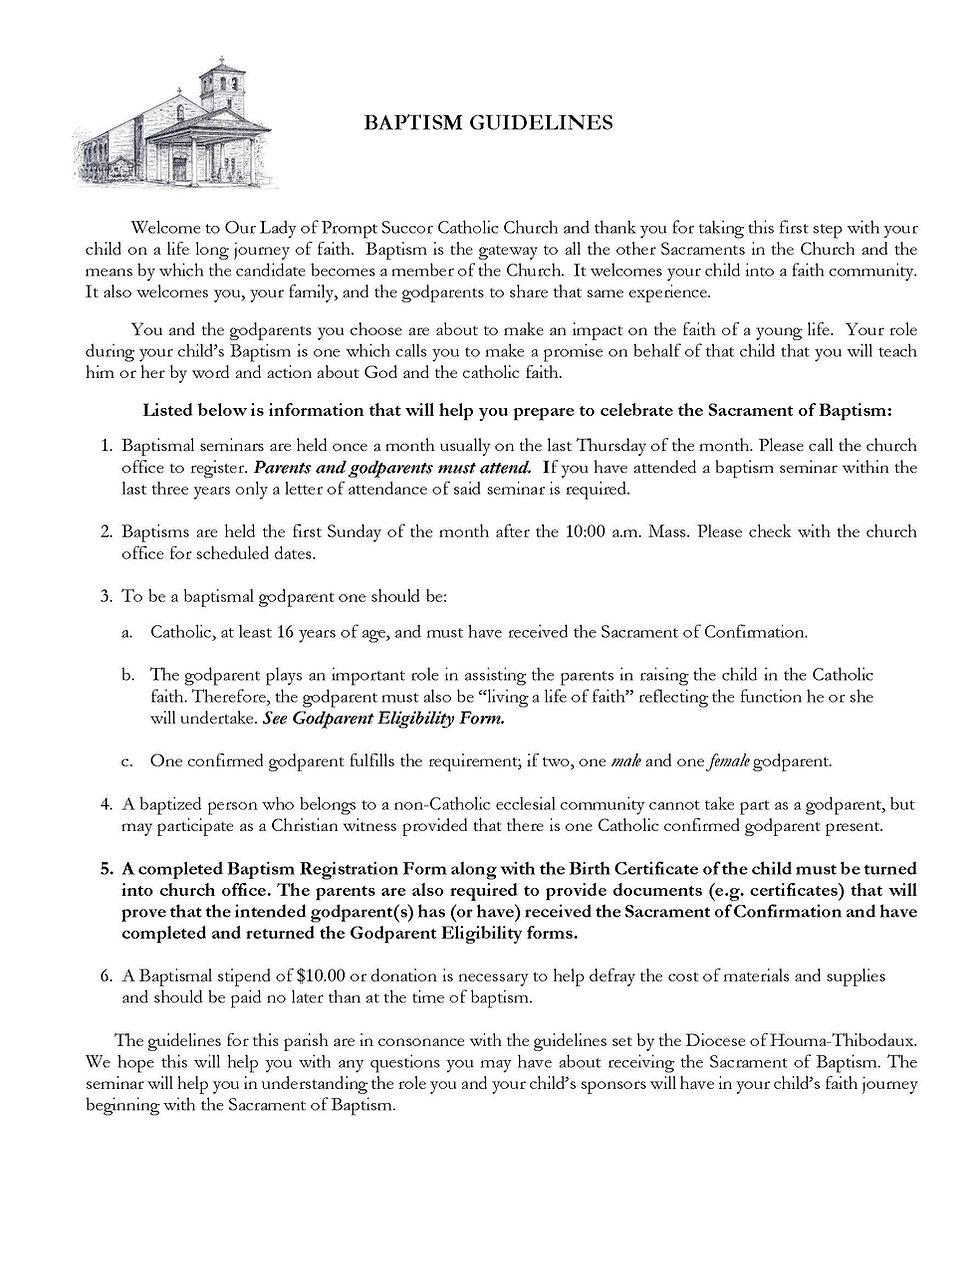 Baptism Guidelines.jpg